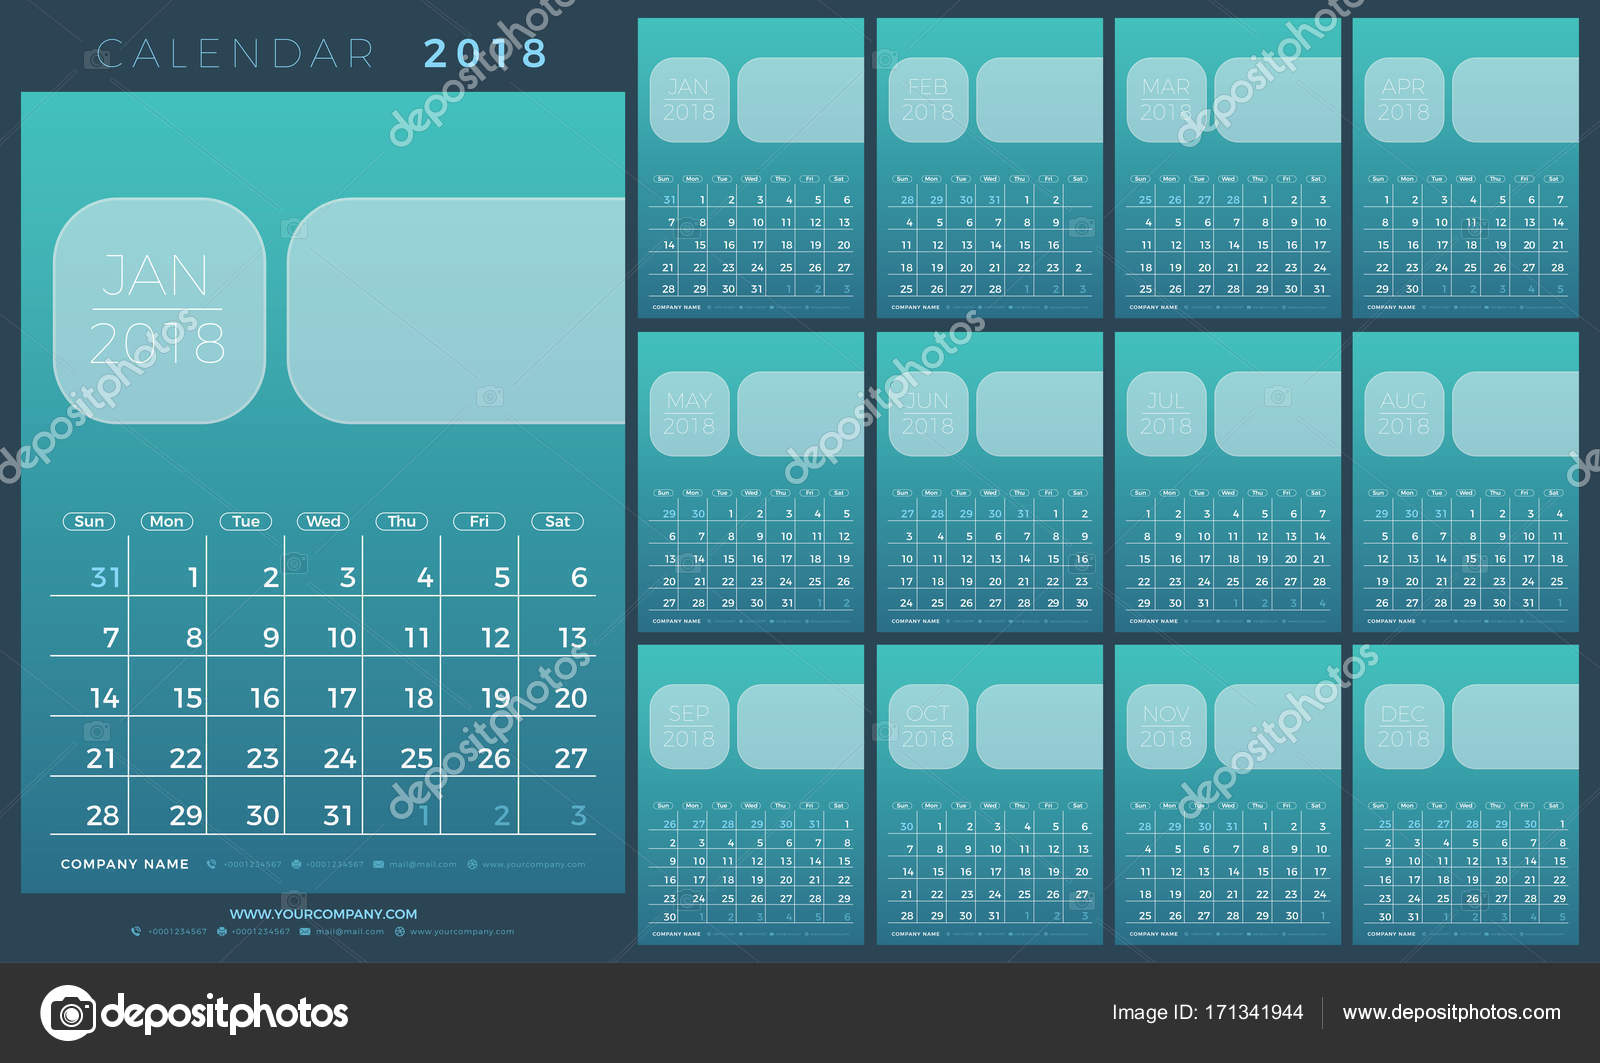 Calendar planner 2018 year simple minimal wall type calendar calendar planner 2018 year simple minimal wall type calendar template week starts from sunday saigontimesfo